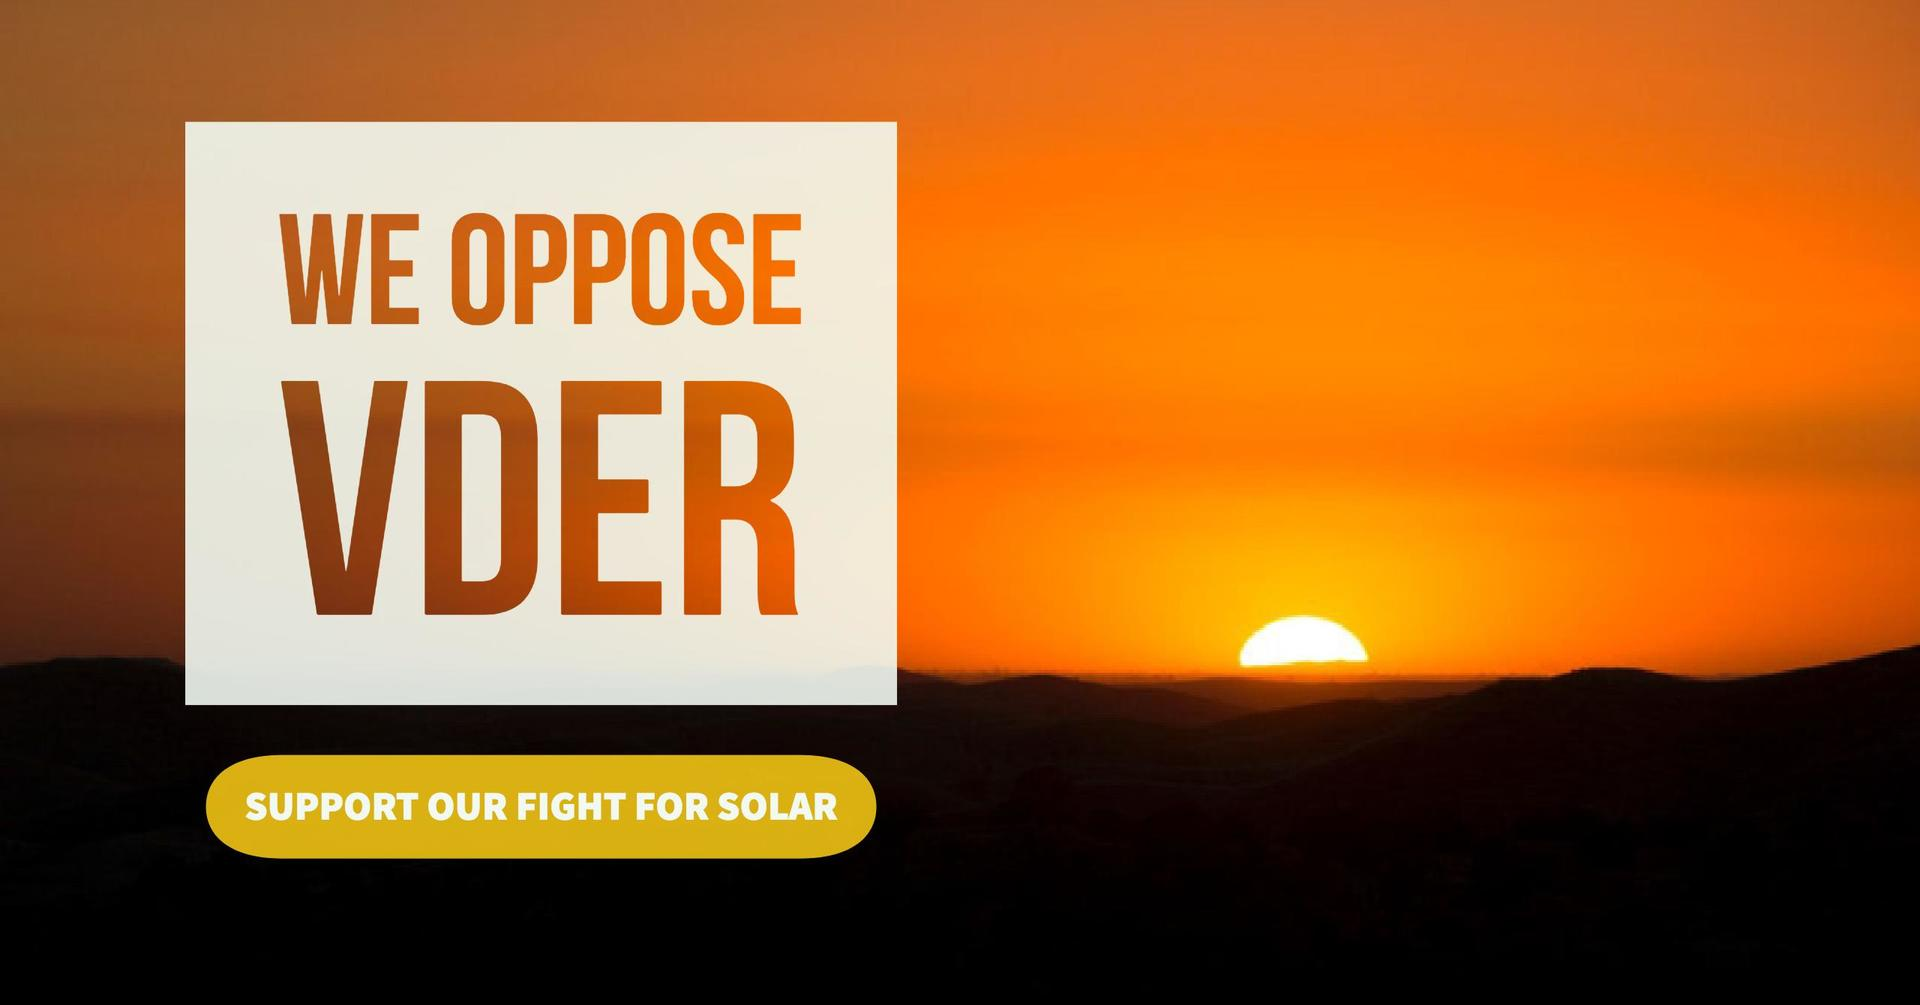 New York Solar Net Metering Is Under Attack Updated 2019